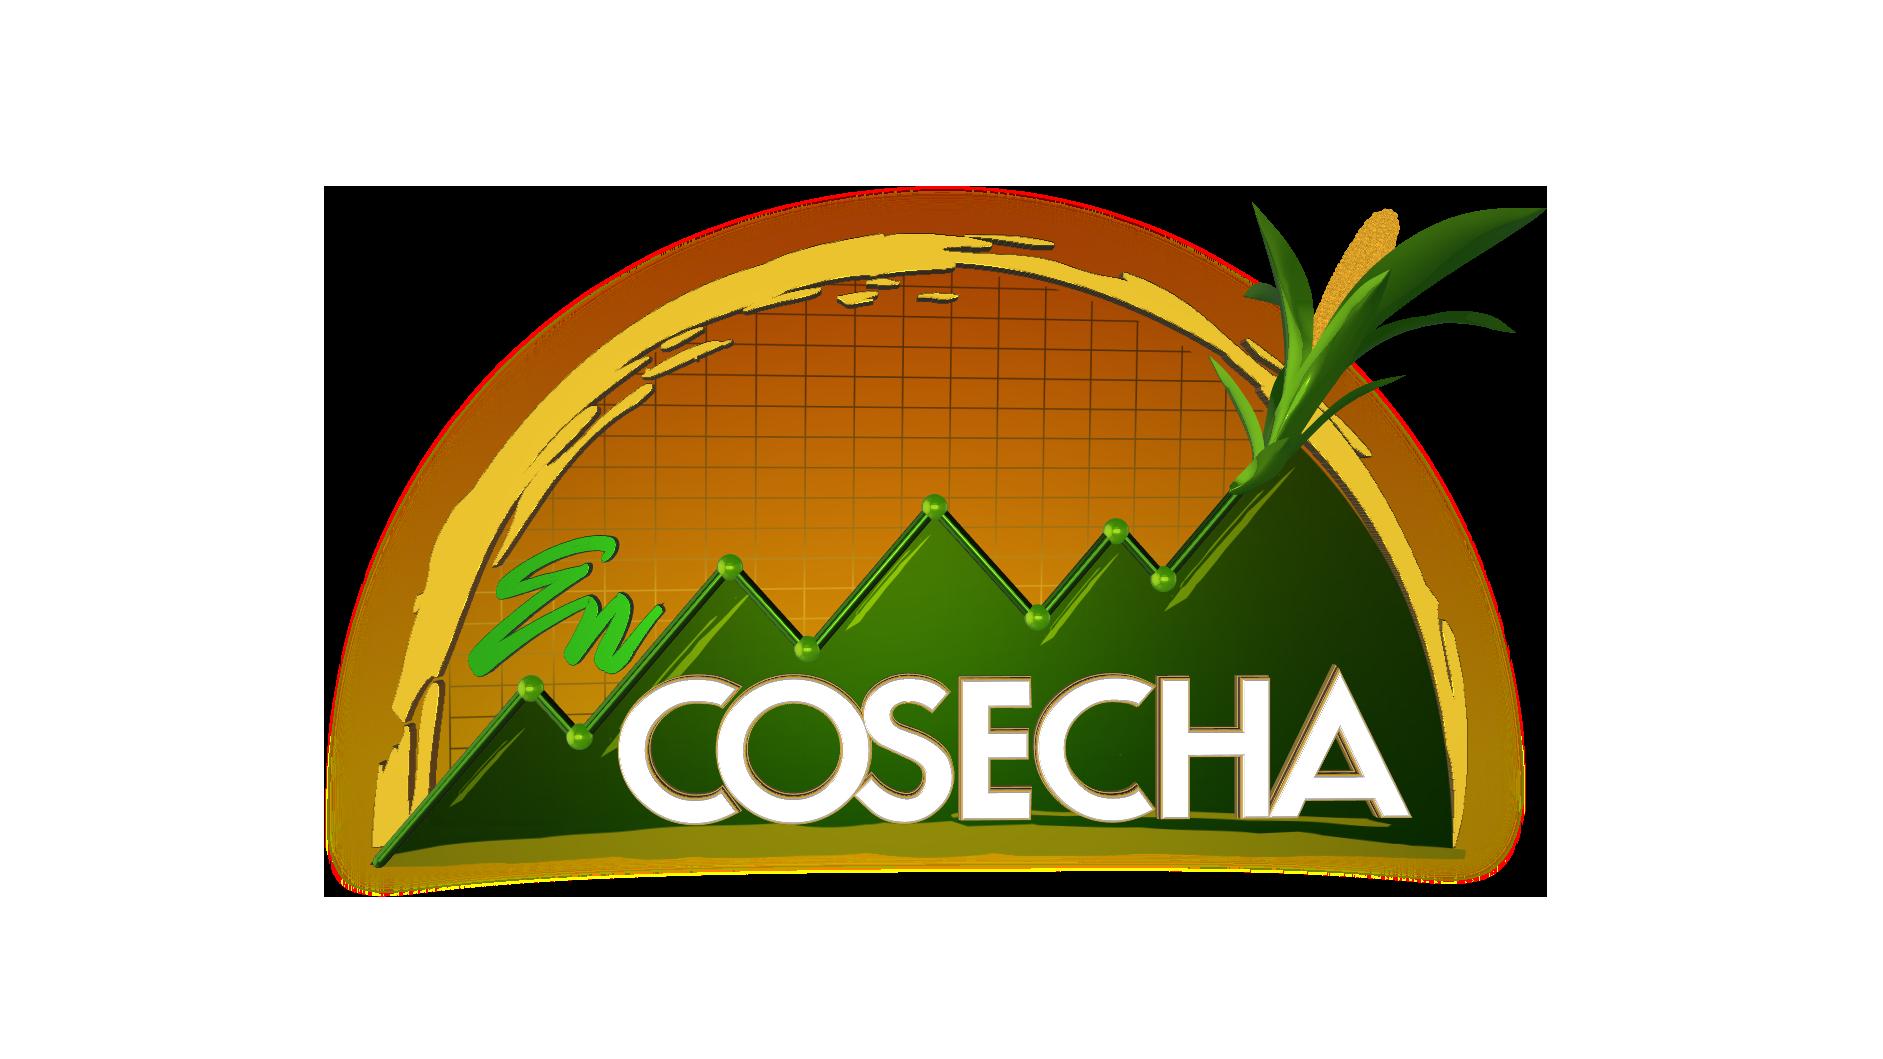 LOGO EN COSECHA - TRANSPARENCIA - PNG